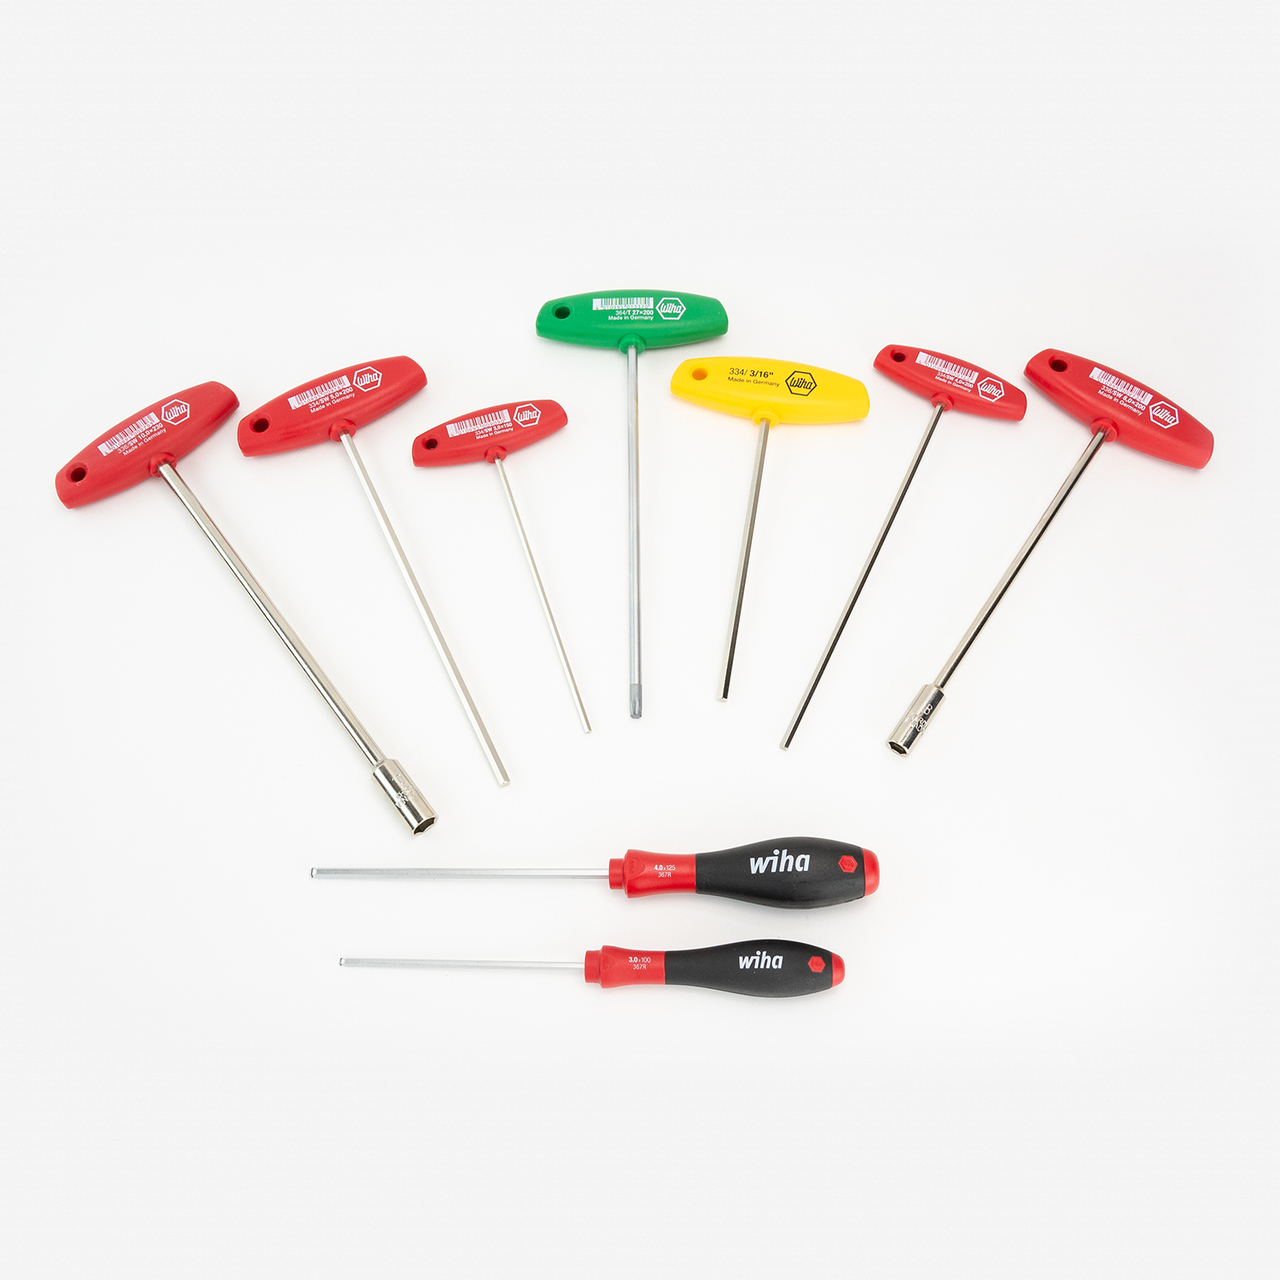 Wiha Complete Set of Chain Saw Tools - KC Tool